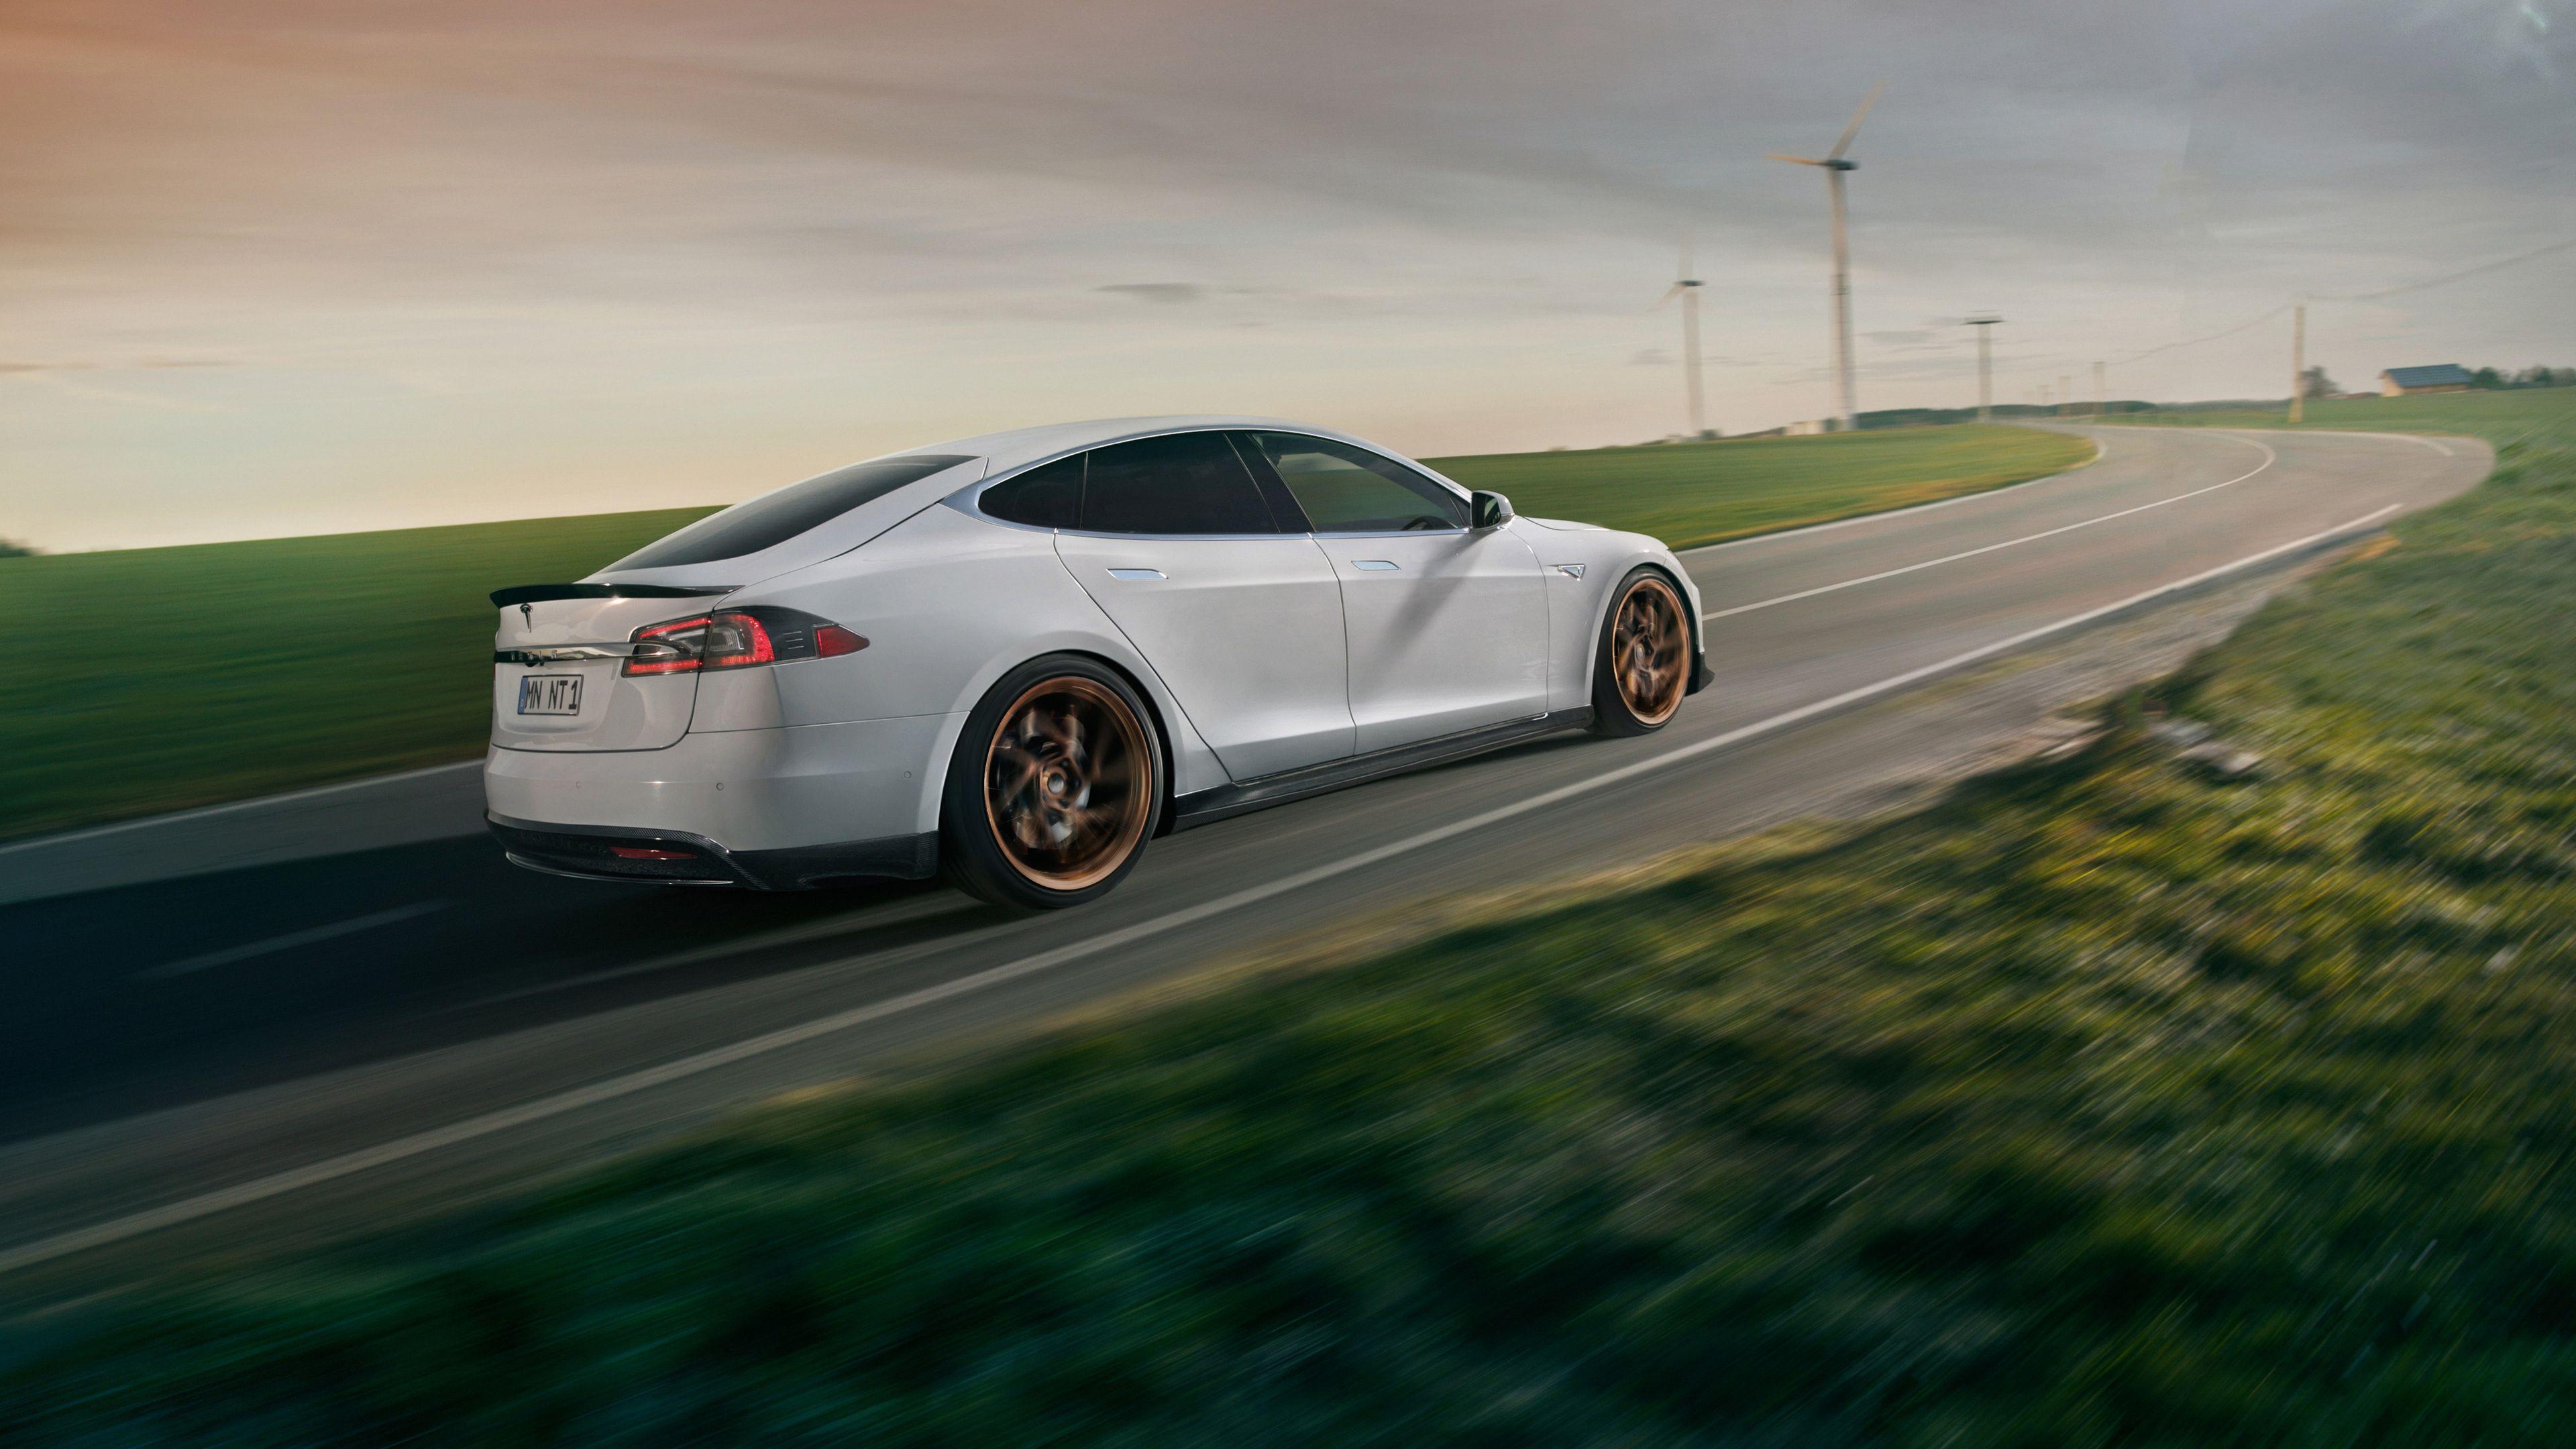 Novitec Tesla Model S tesla wallpapers, tesla model s